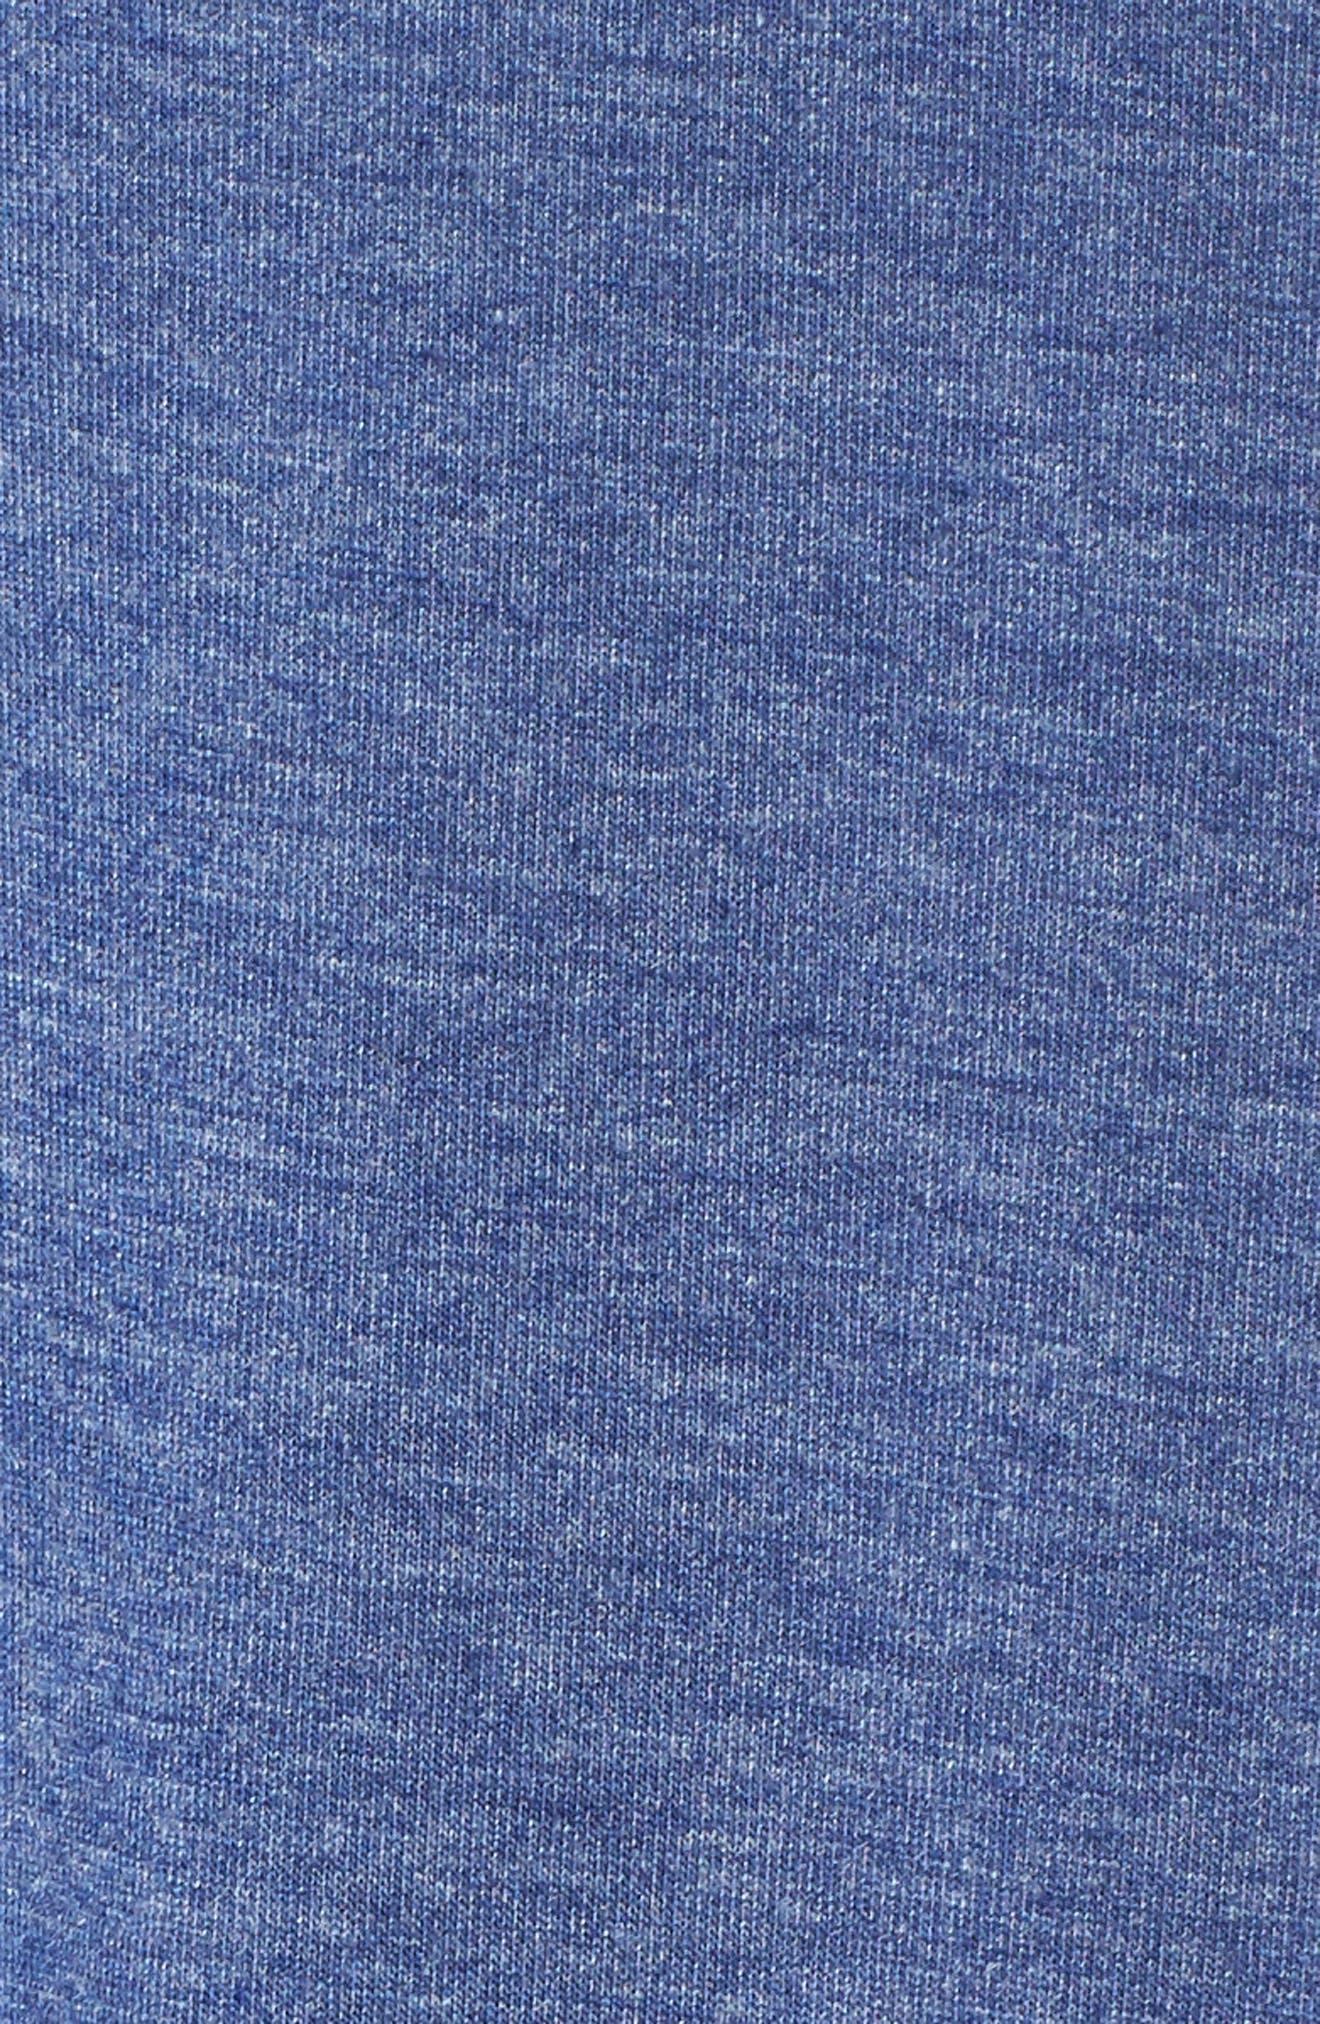 Honeydew All American Sleep Shirt,                             Alternate thumbnail 33, color,